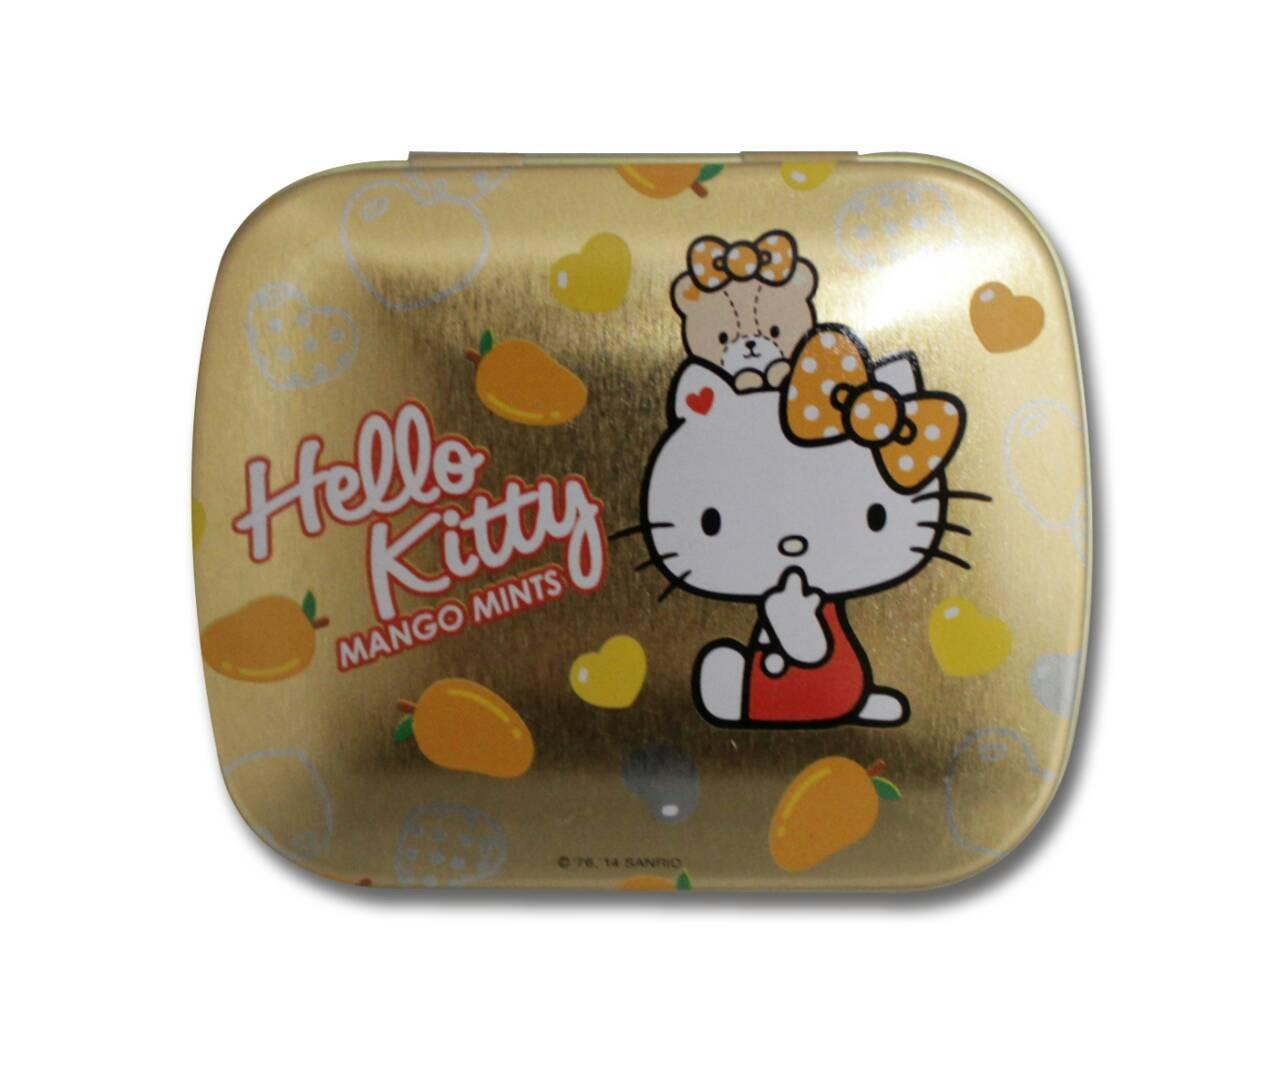 CHOKITO巧趣多kitty無糖薄荷糖-芒果口味 (14公克/盒)   *維康